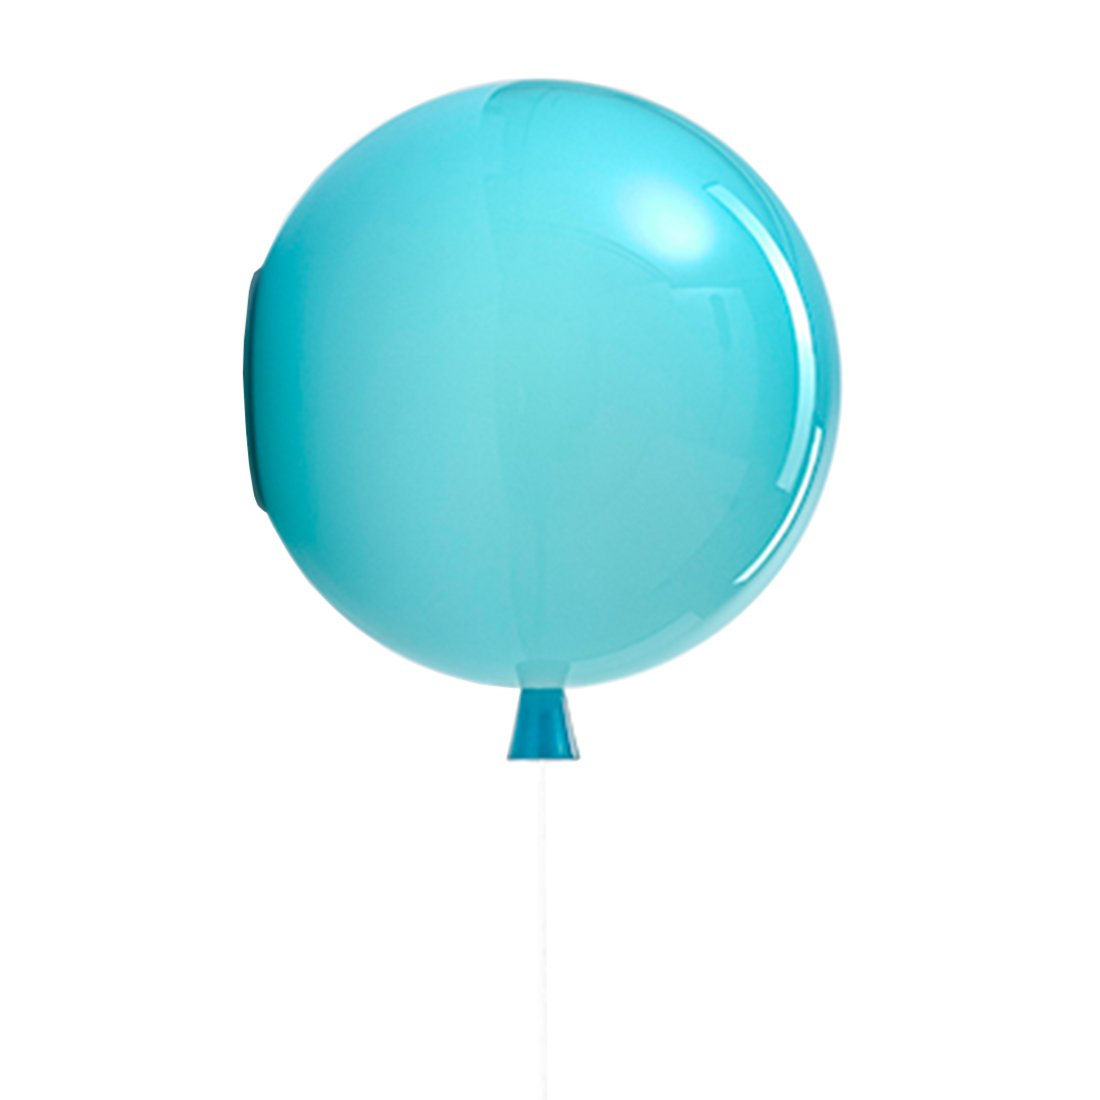 Brokis Memory Wandlamp Small Glossy Turquoise